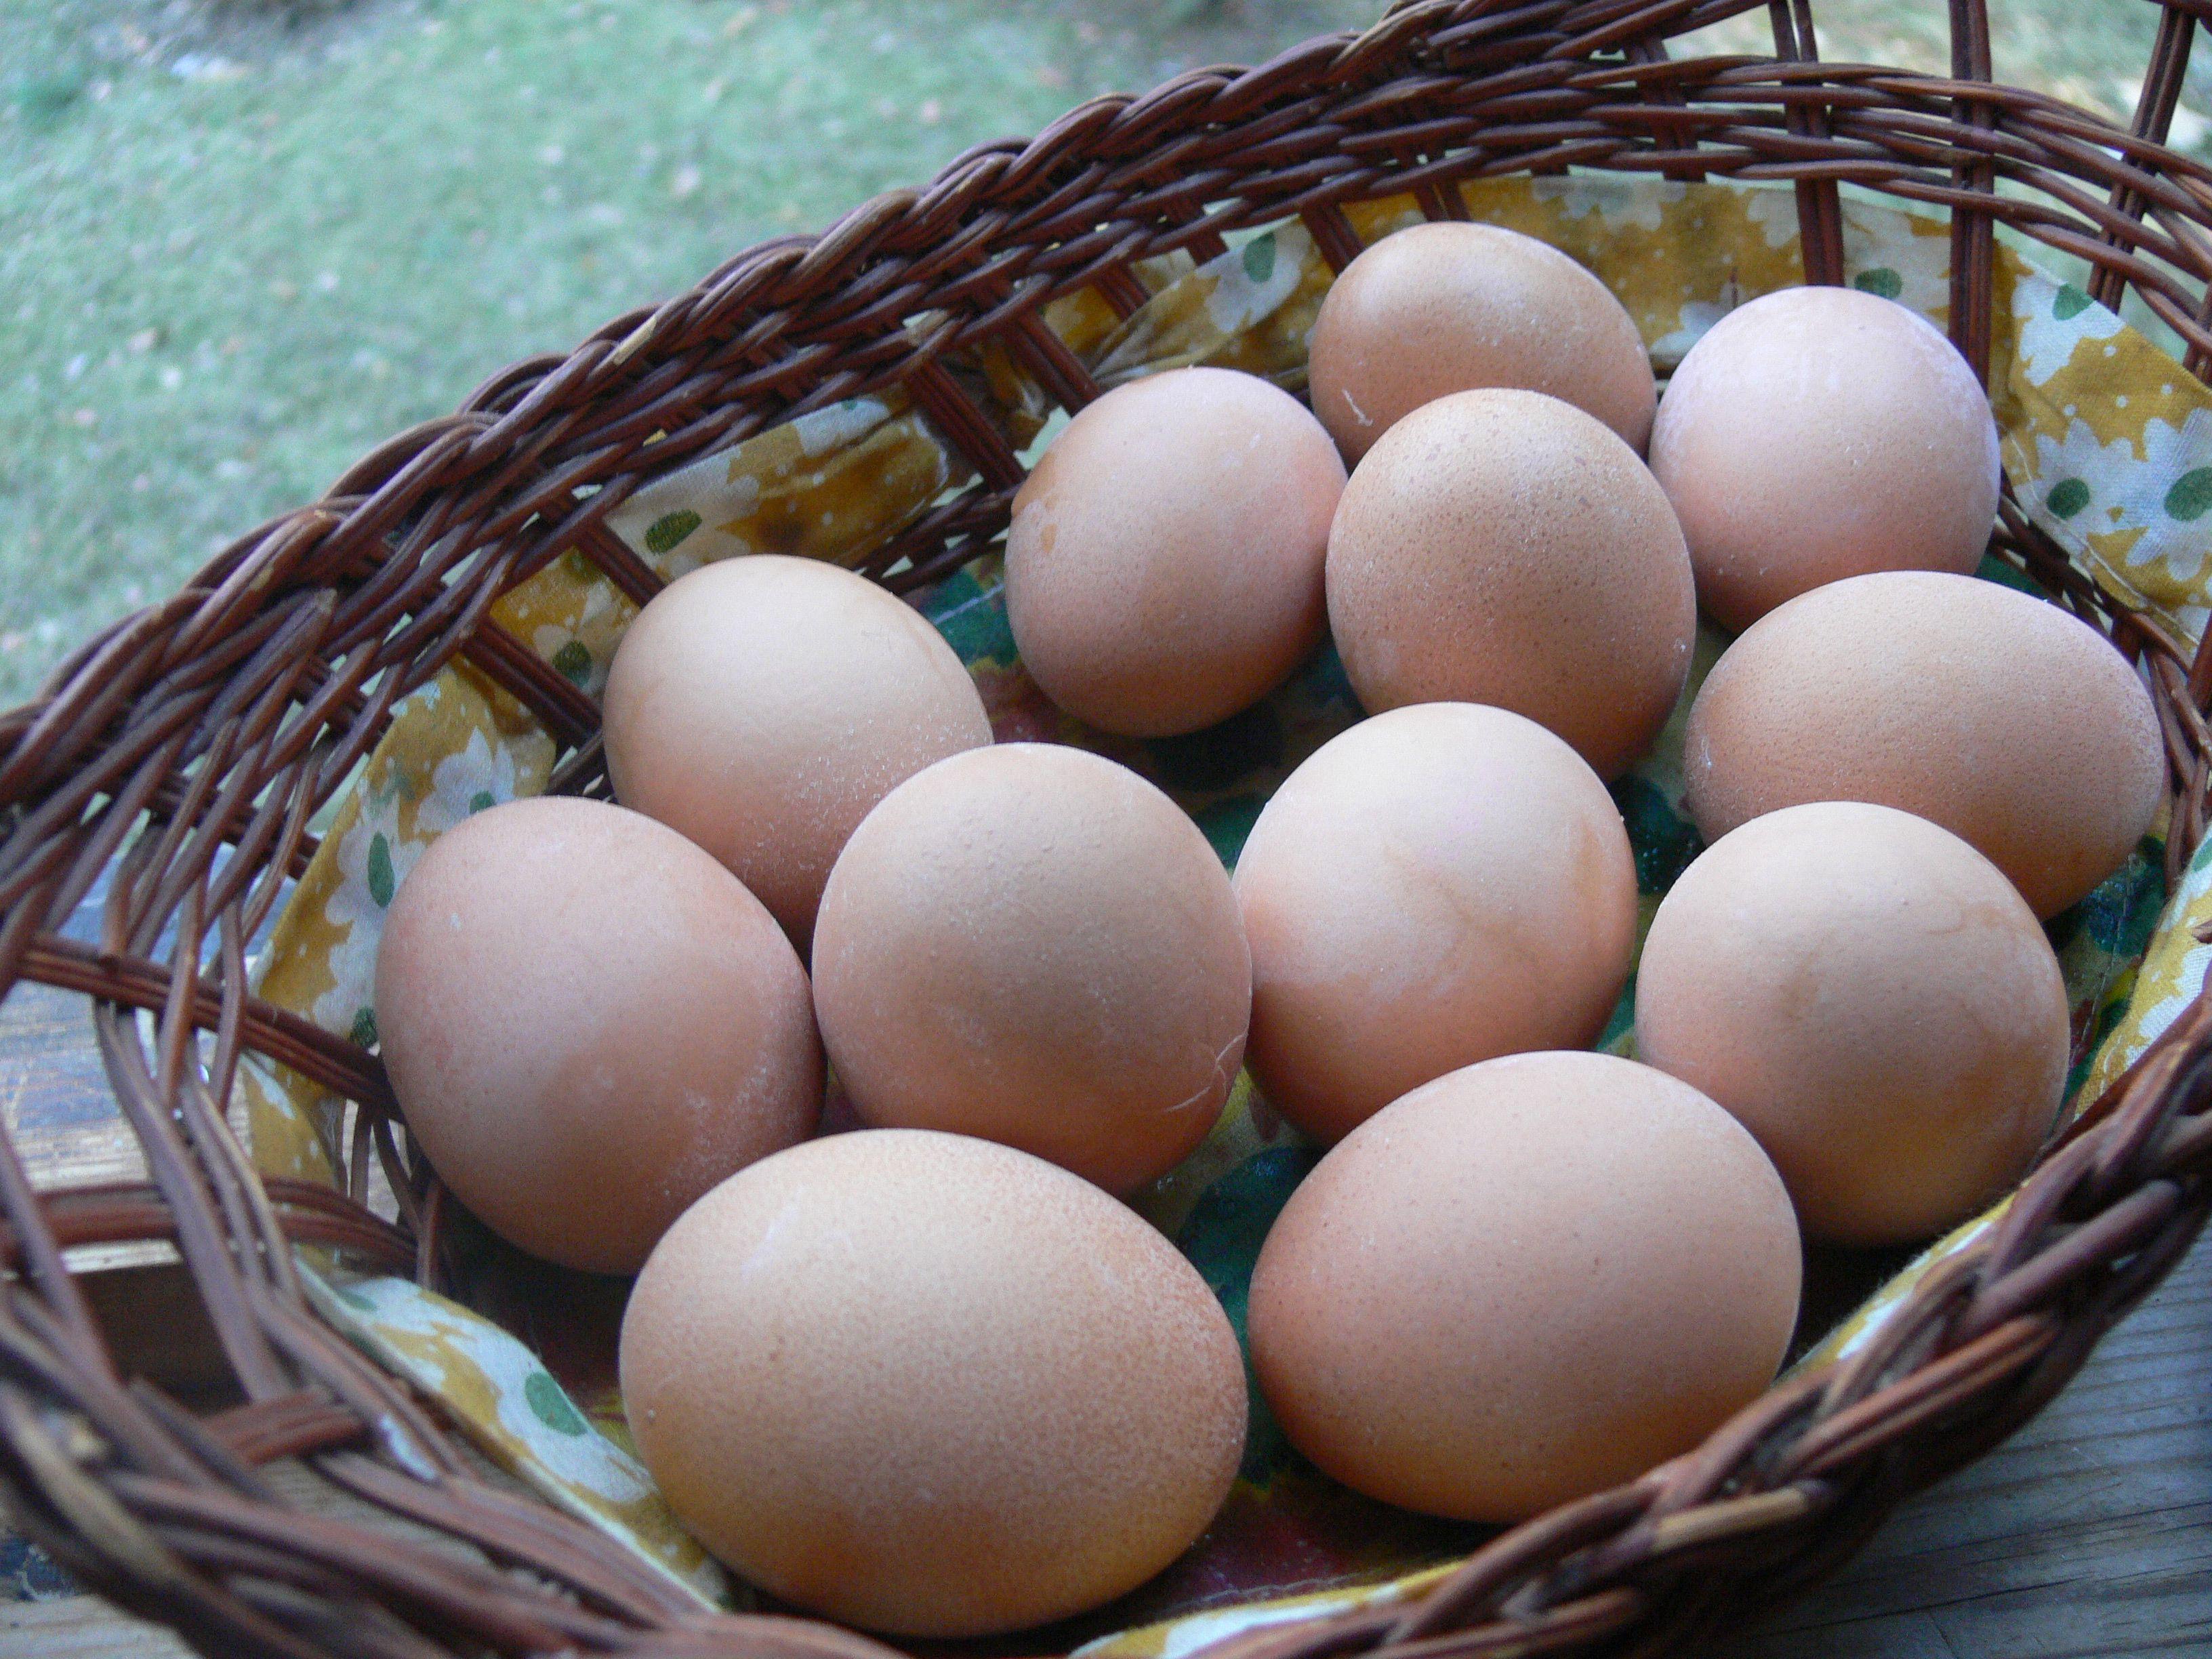 Eggs symbol of reviving life spring equinox 2012 slavic eggs symbol of reviving life spring equinox 2012 biocorpaavc